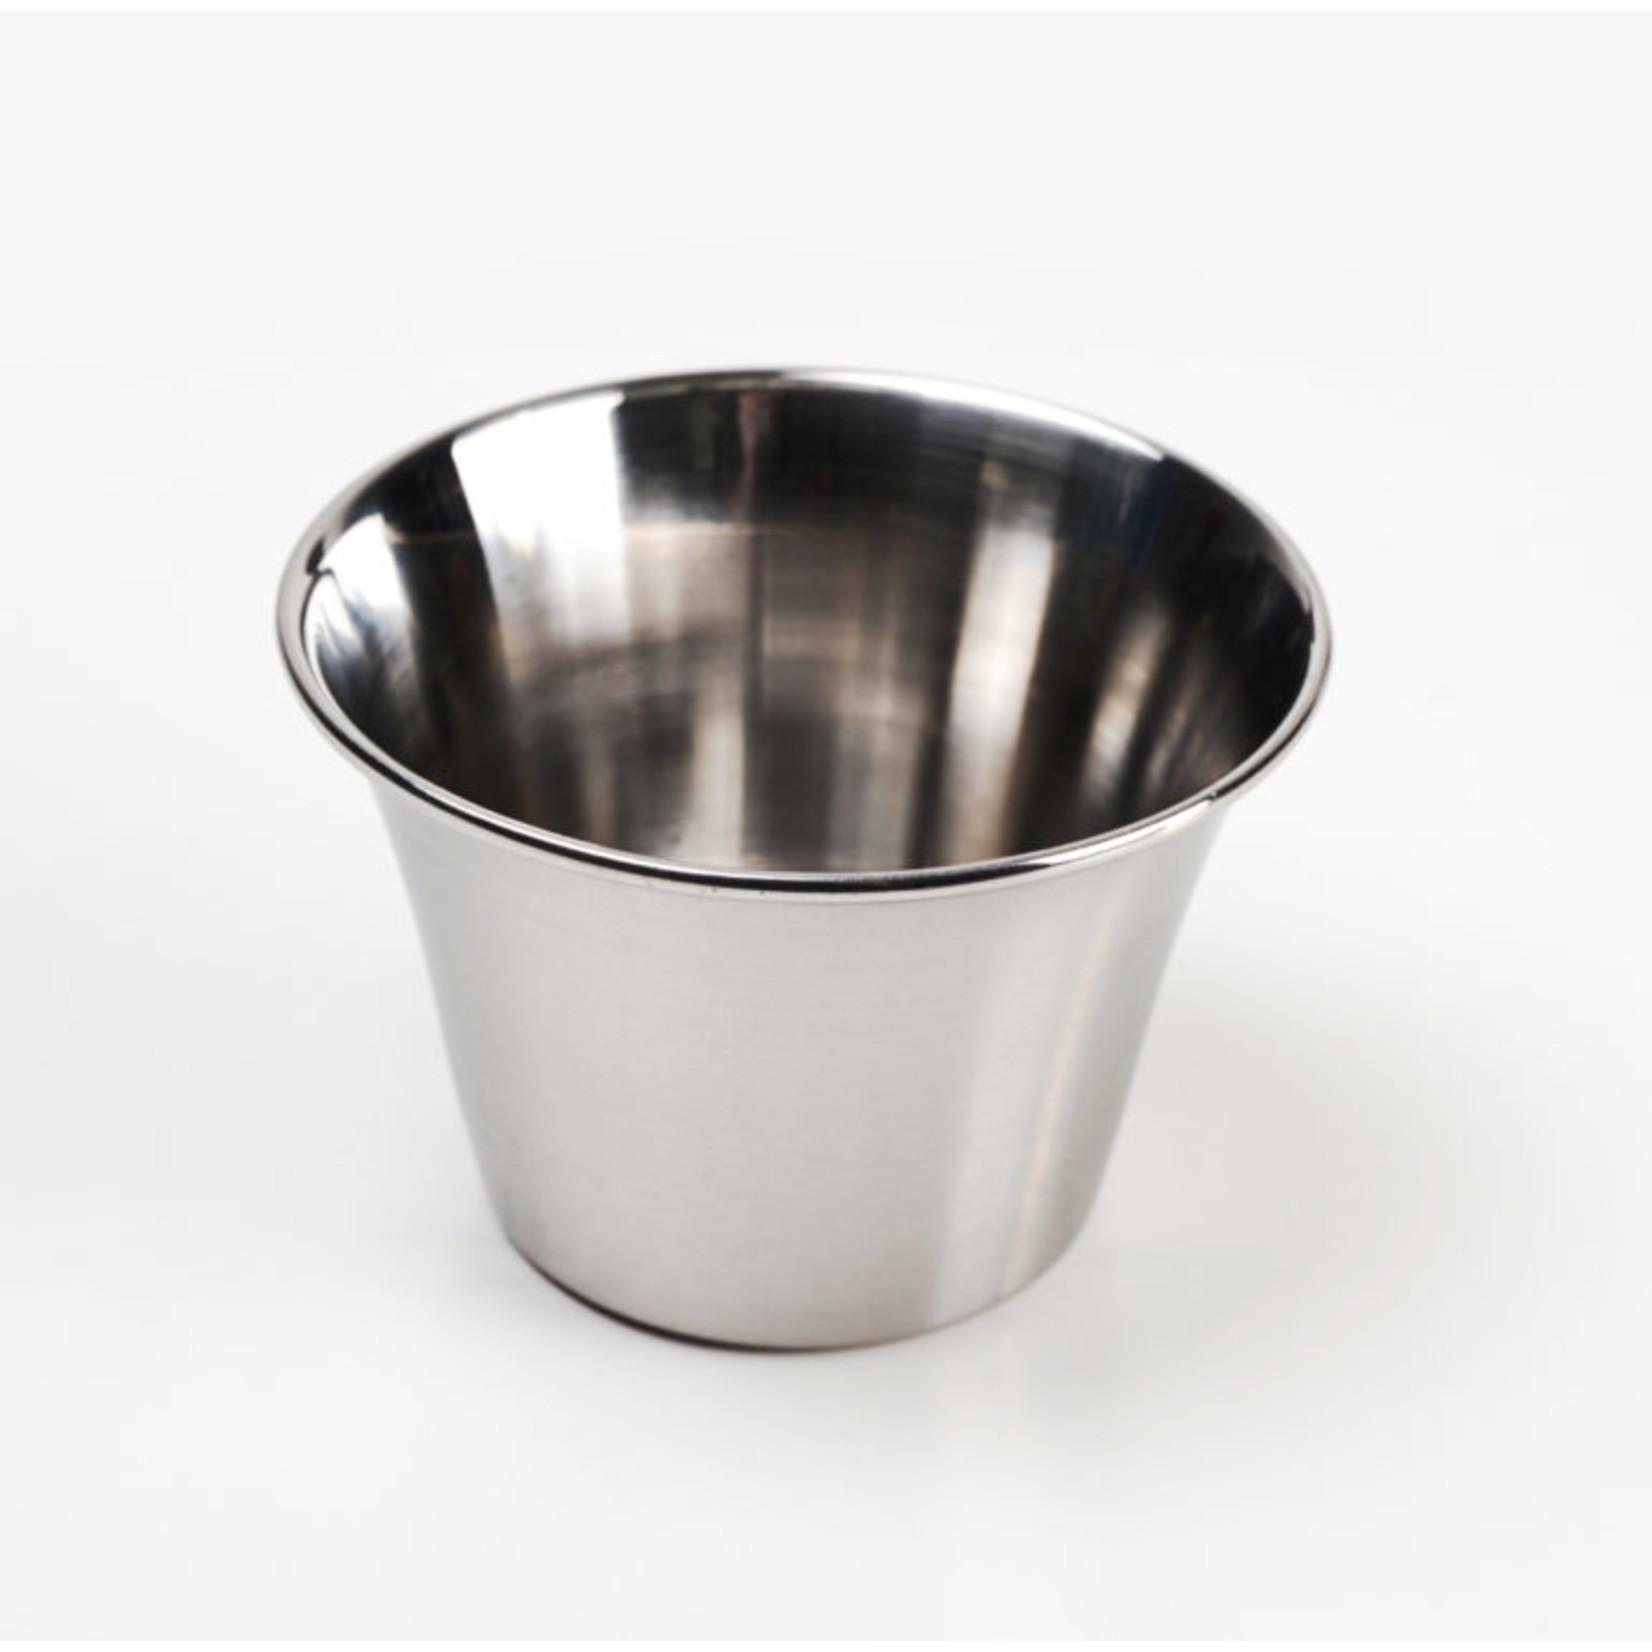 RSVP International Sauce Cup